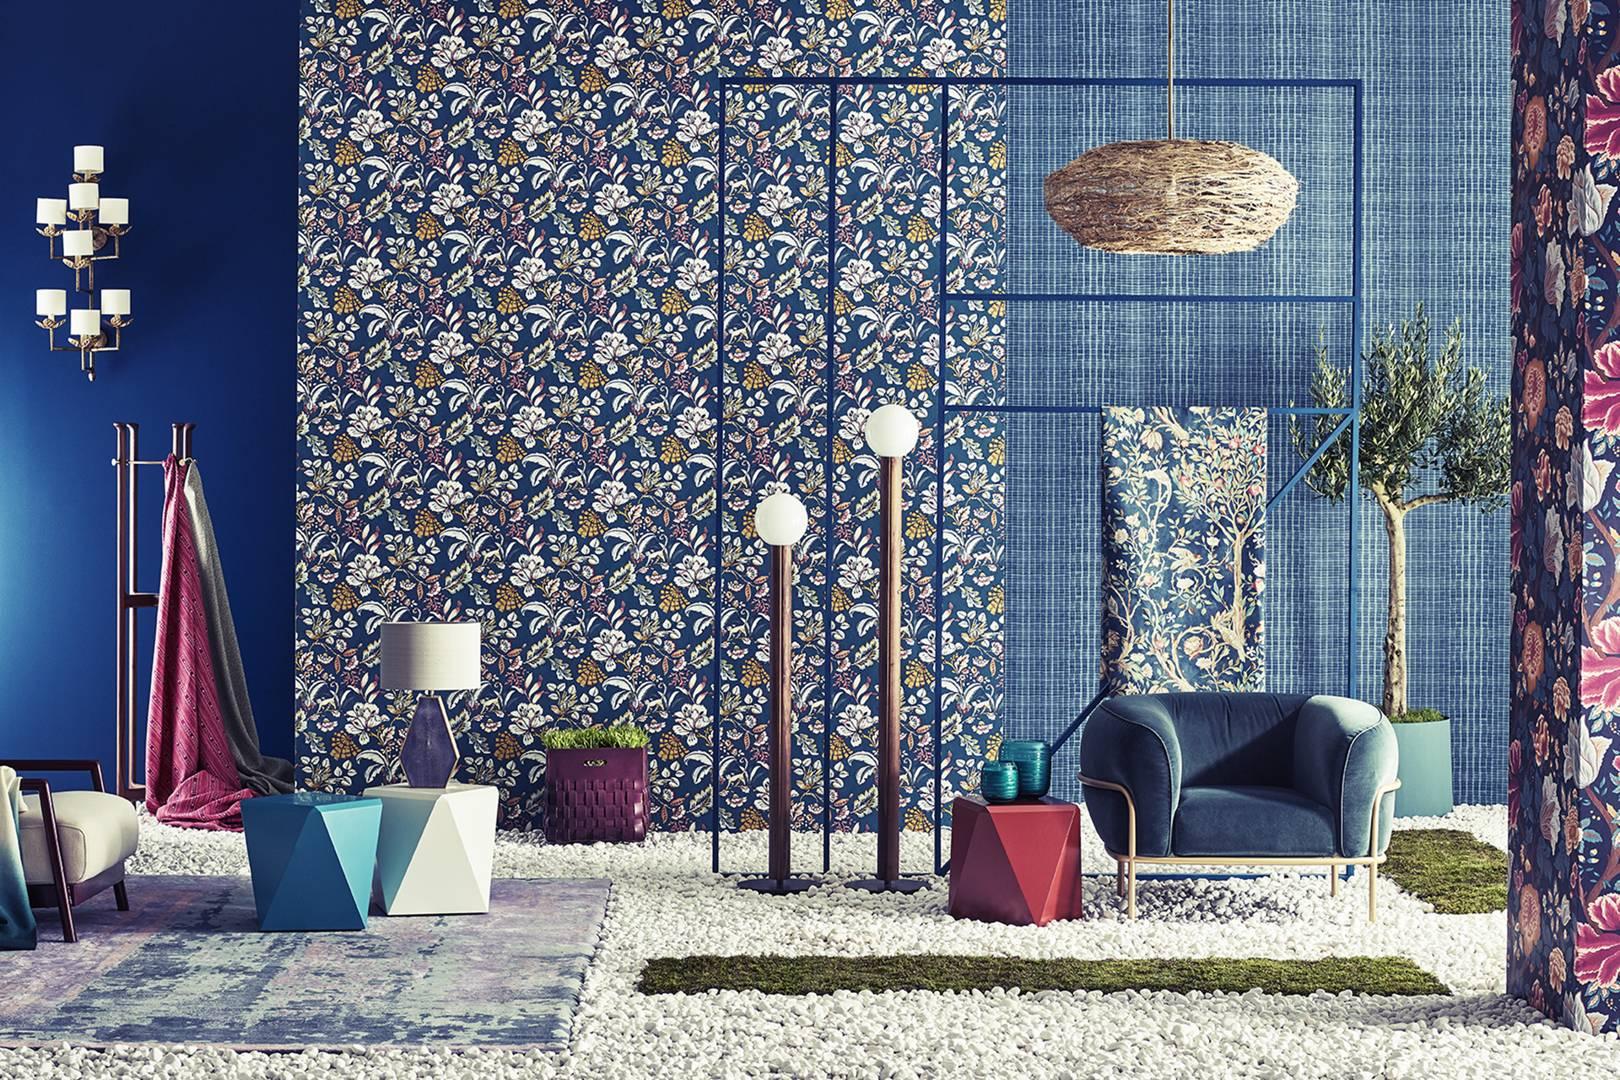 Charmant Design Centre Chelsea Harbour   The Biggest New Interiors ...